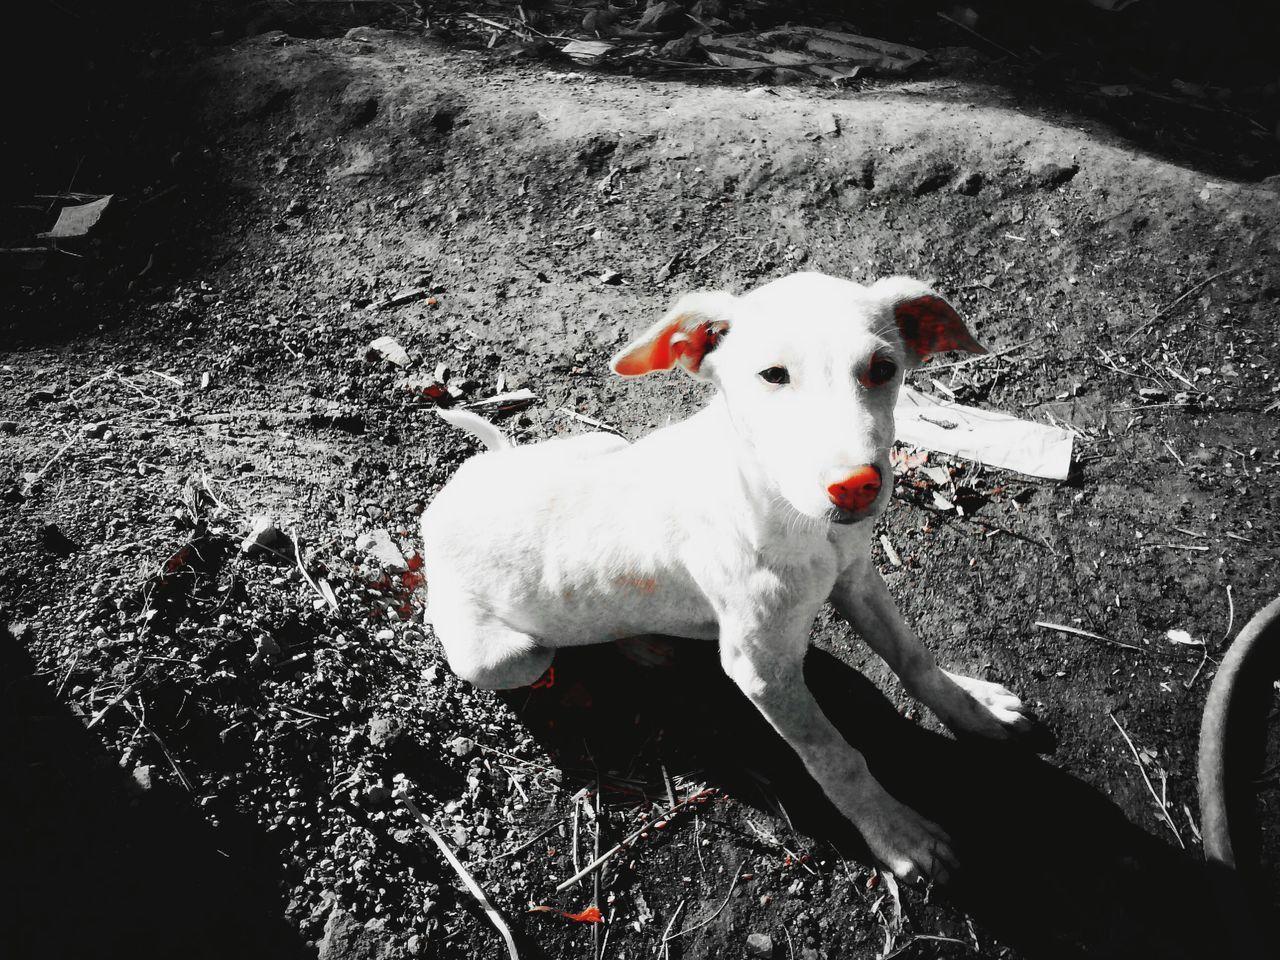 HIGH ANGLE PORTRAIT OF DOG ON FIELD DURING RAINY SEASON